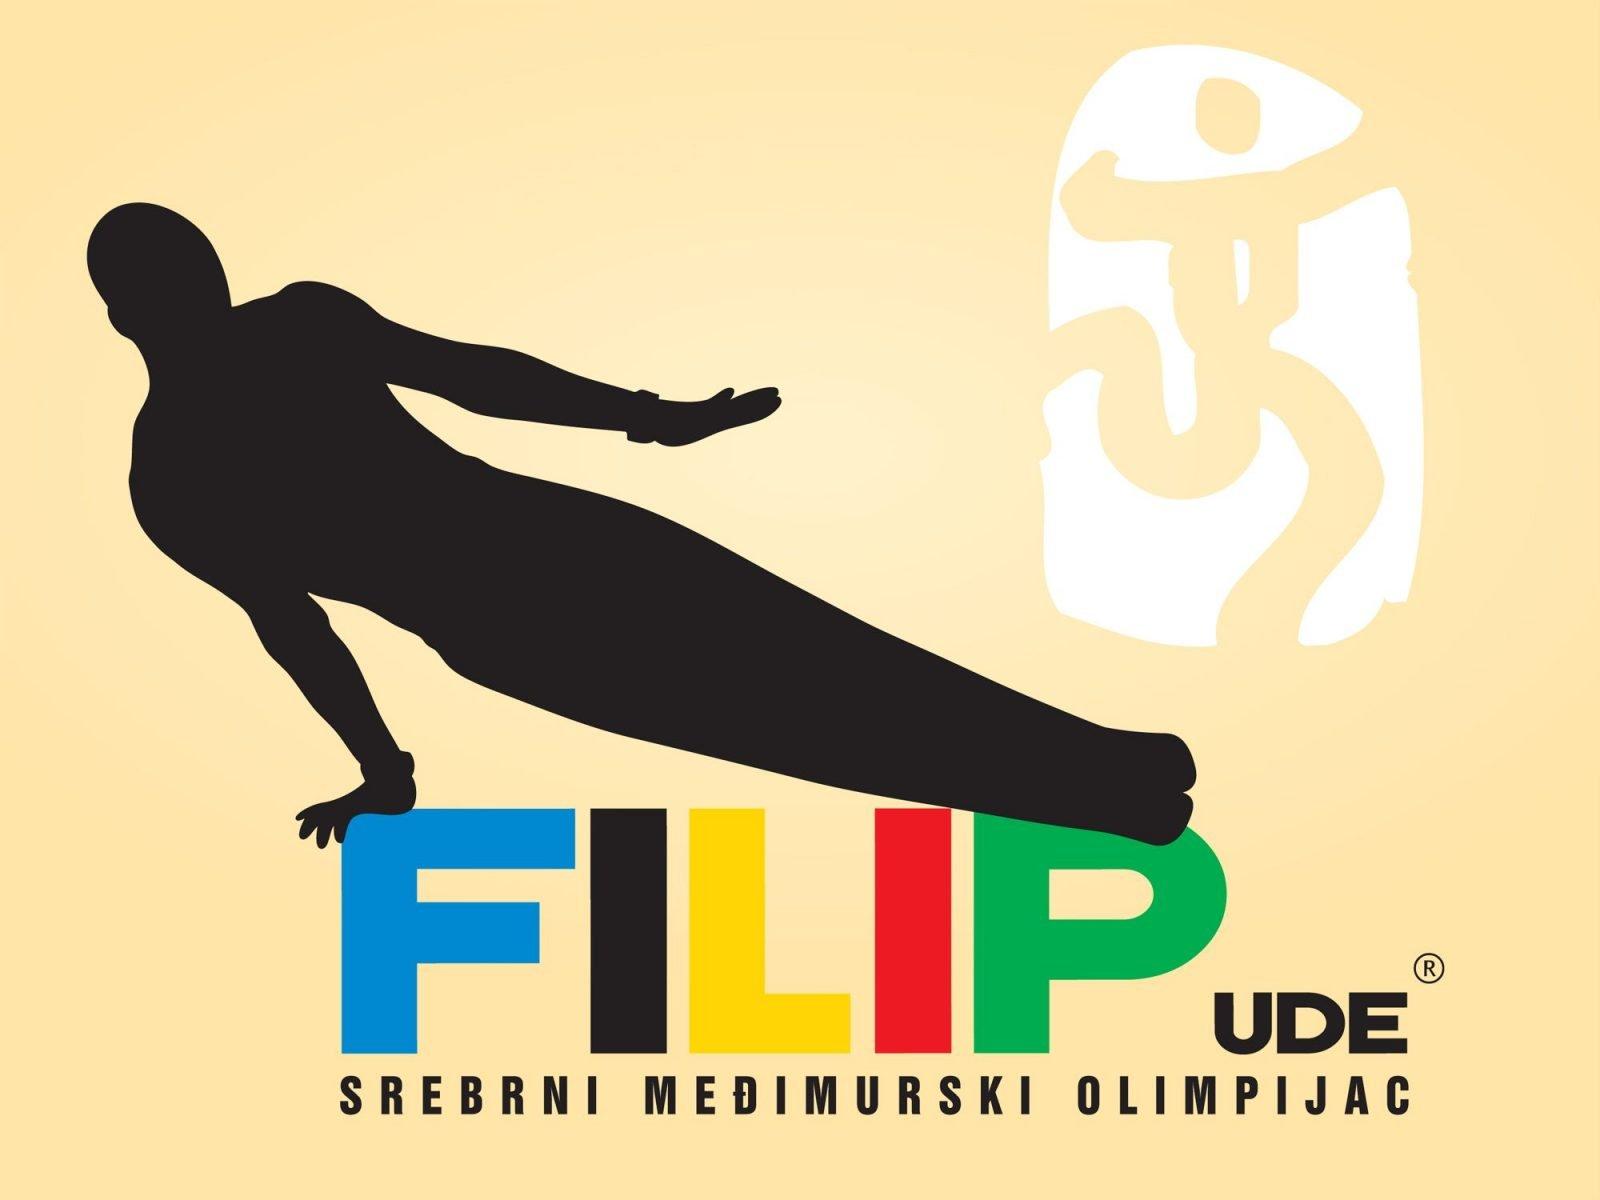 Filip Ude logo